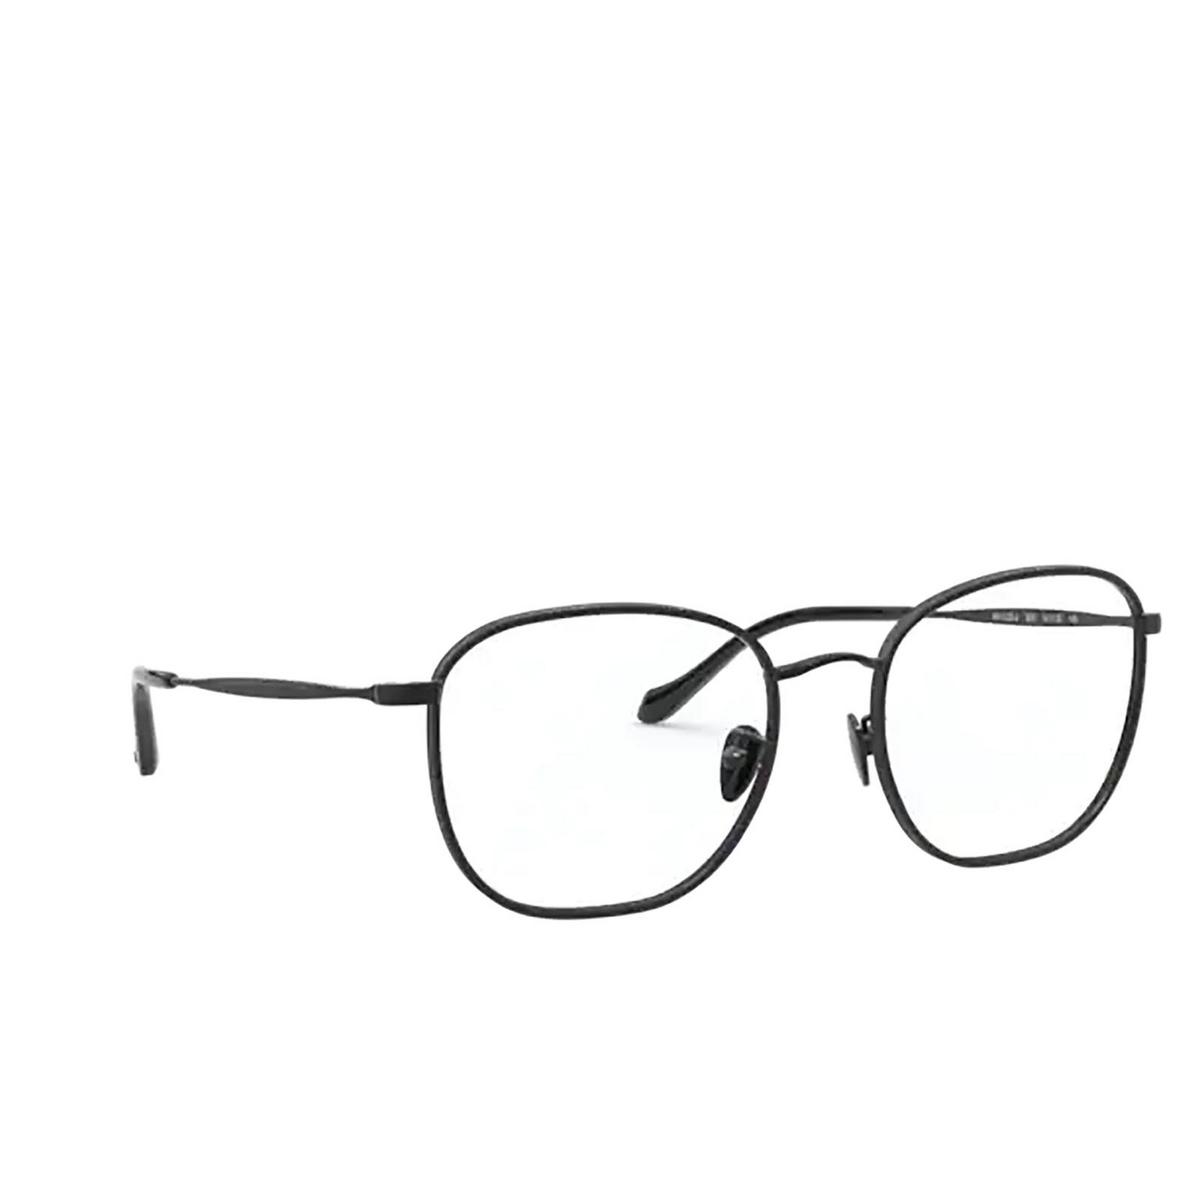 Giorgio Armani® Square Eyeglasses: AR5105J color Black&matte Black 3001 - three-quarters view.